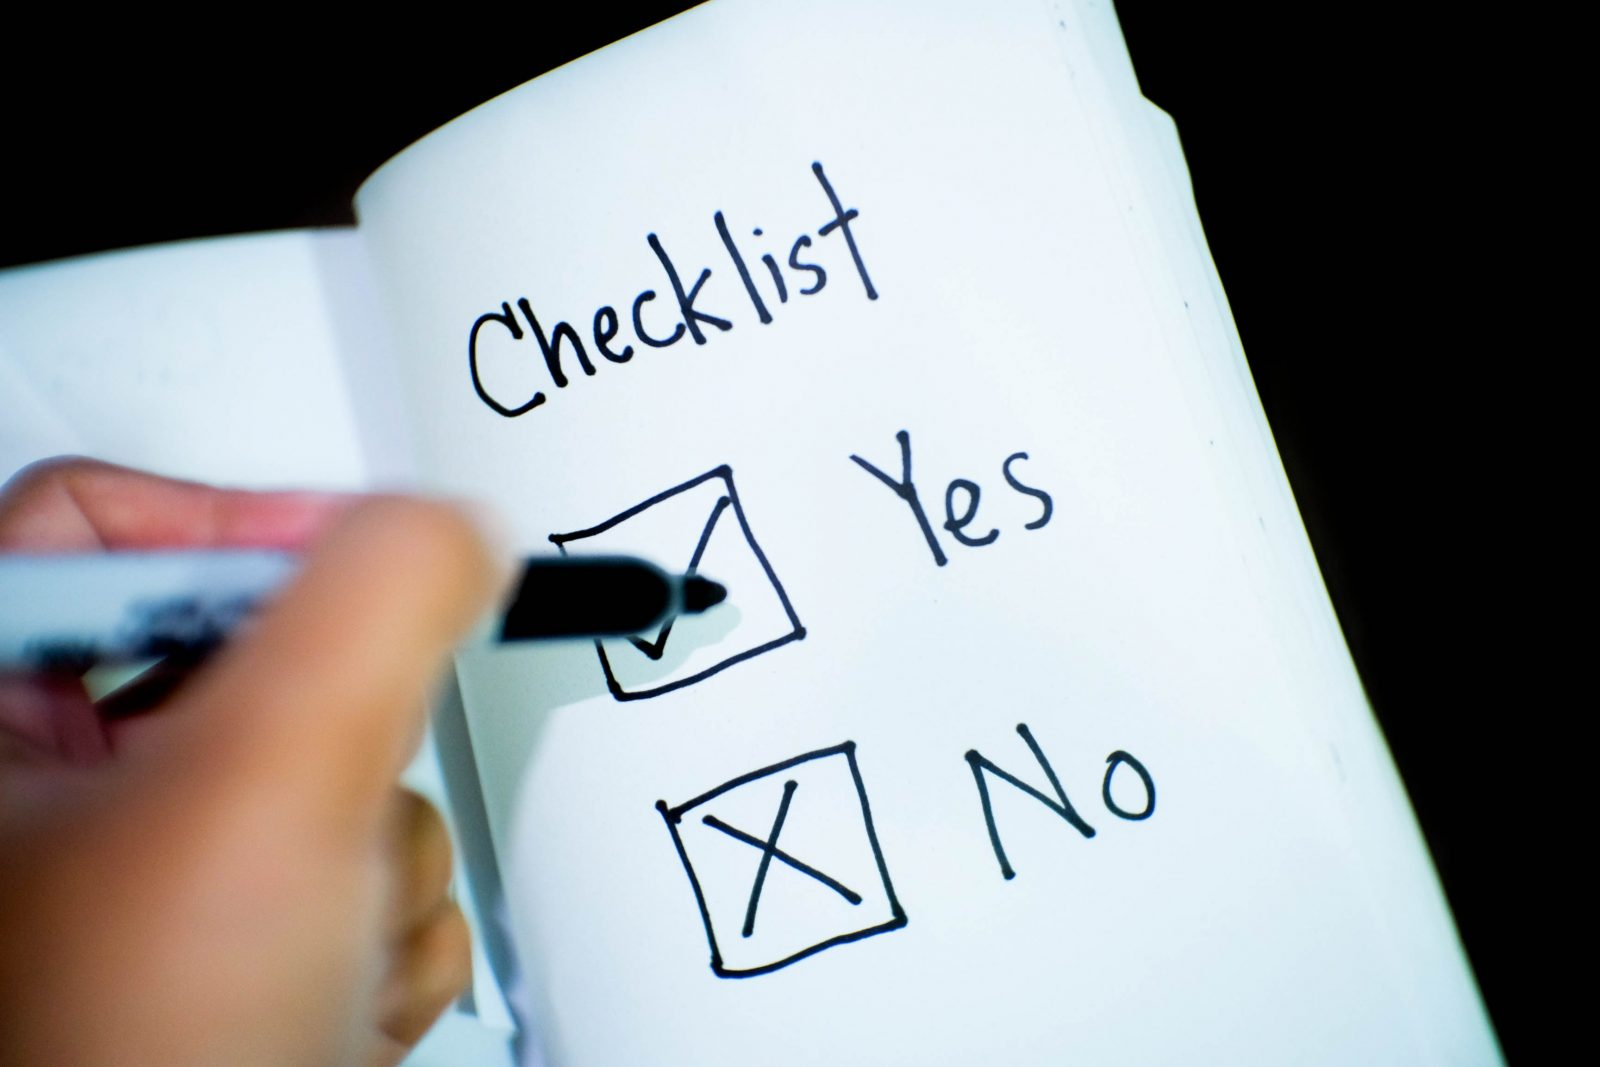 checklist gdpr - Checklist GDPR - Checklist GDPR